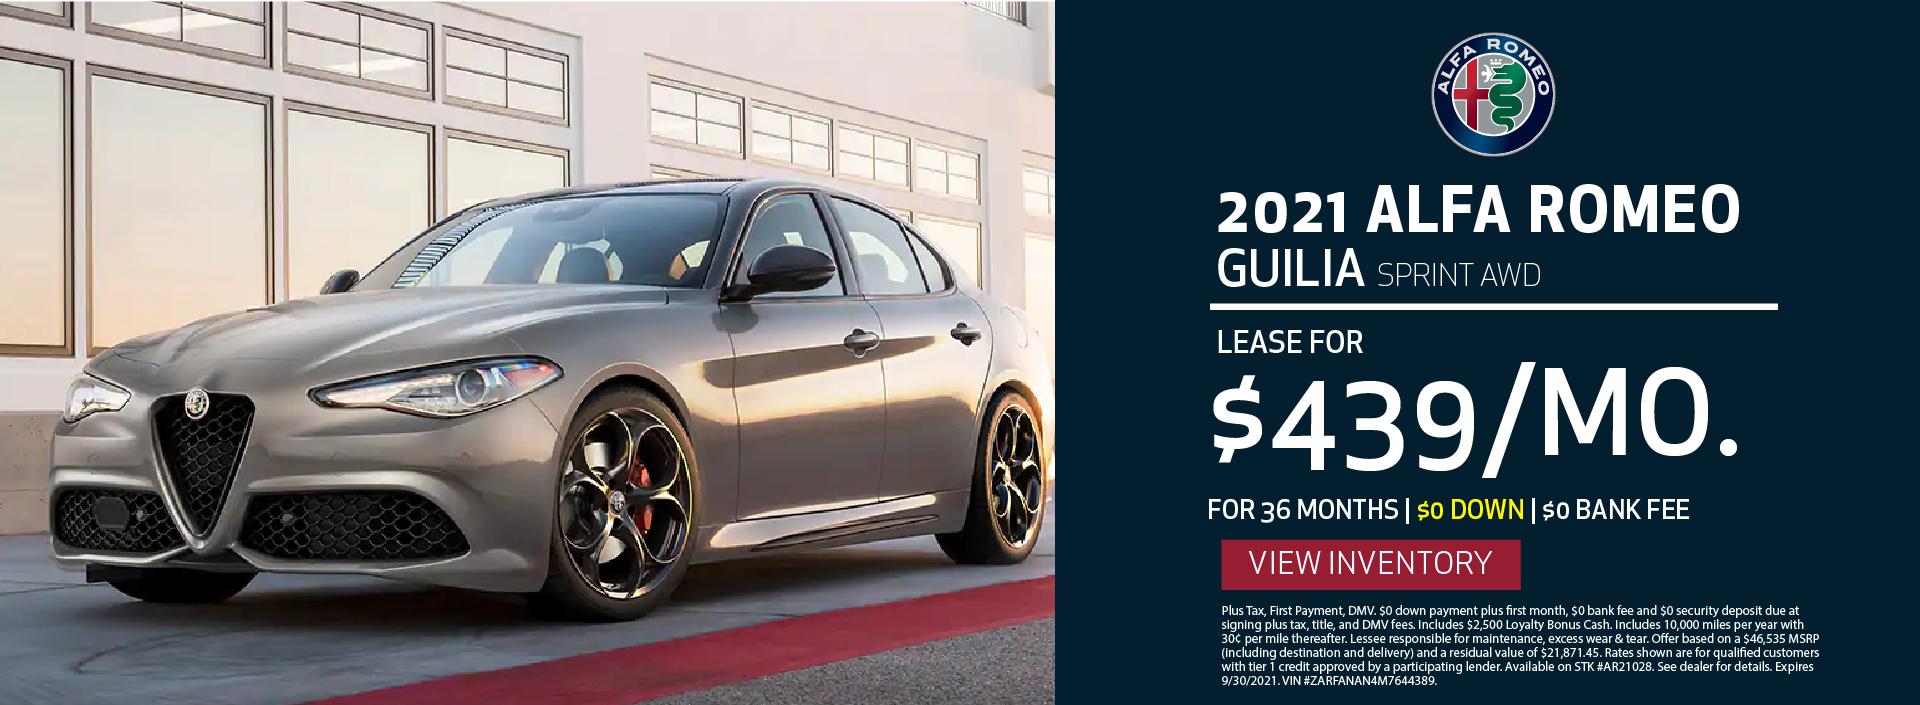 Manhattan Alfa Romeo – 2021 Guilia Sprint – September 2021